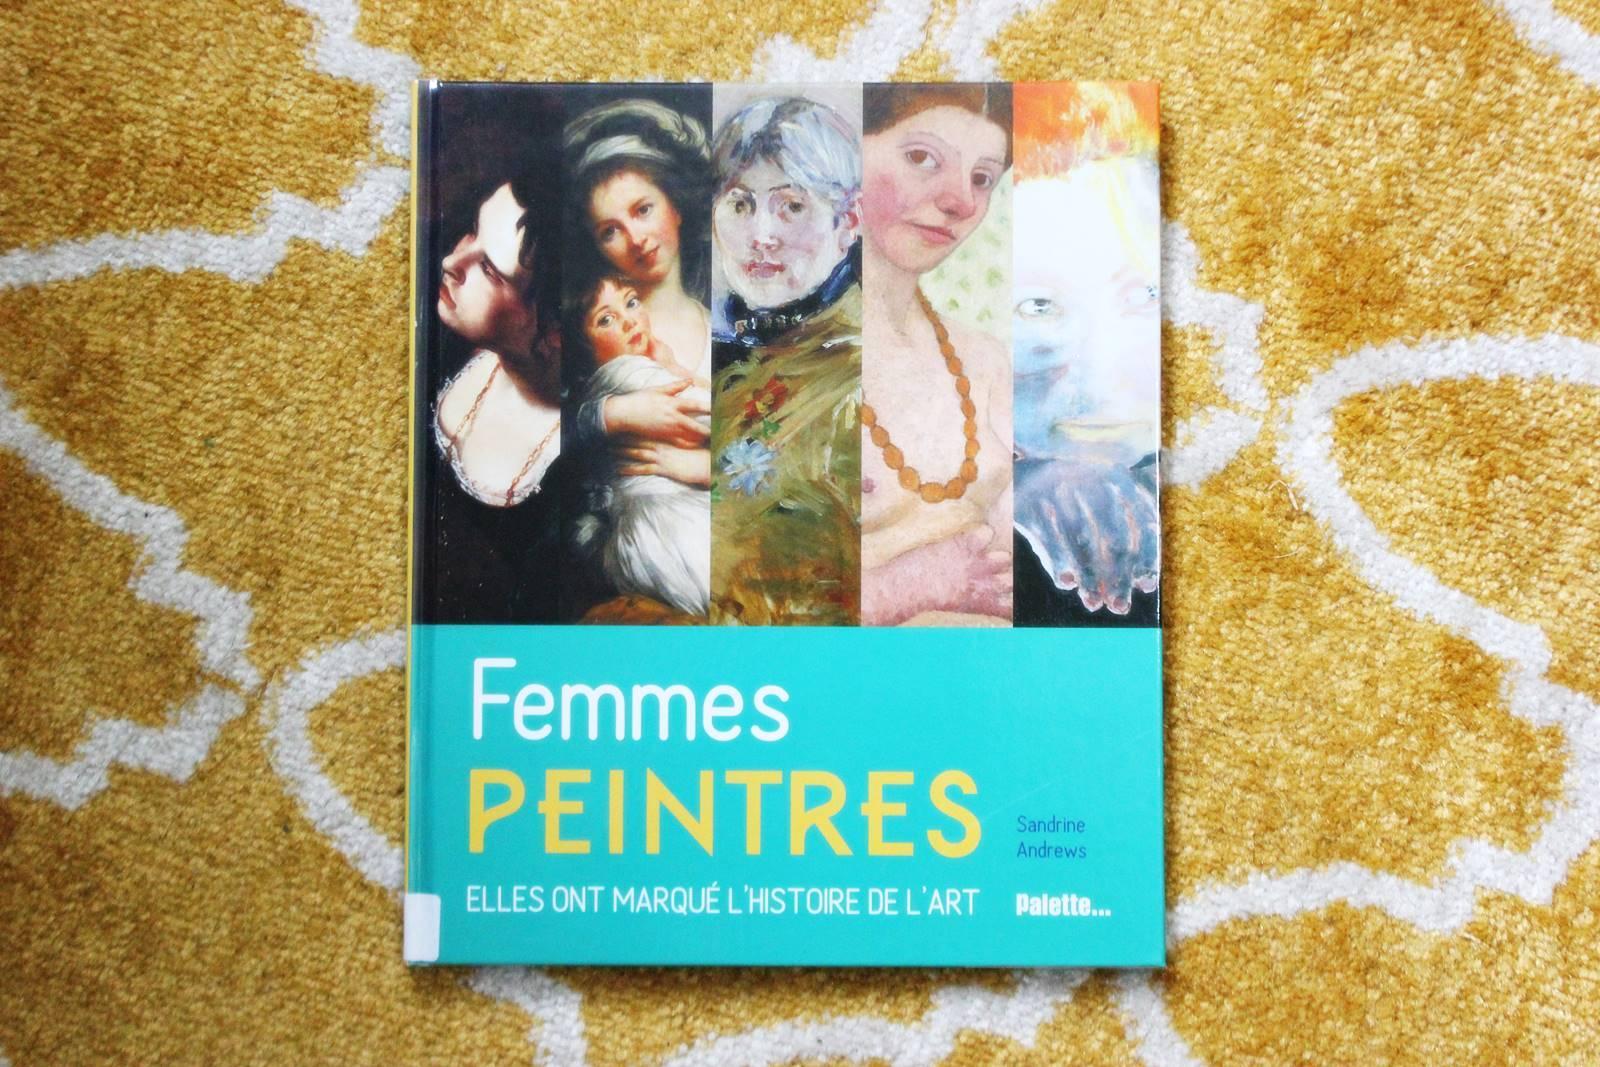 Femmes peintres paletteimg 4830